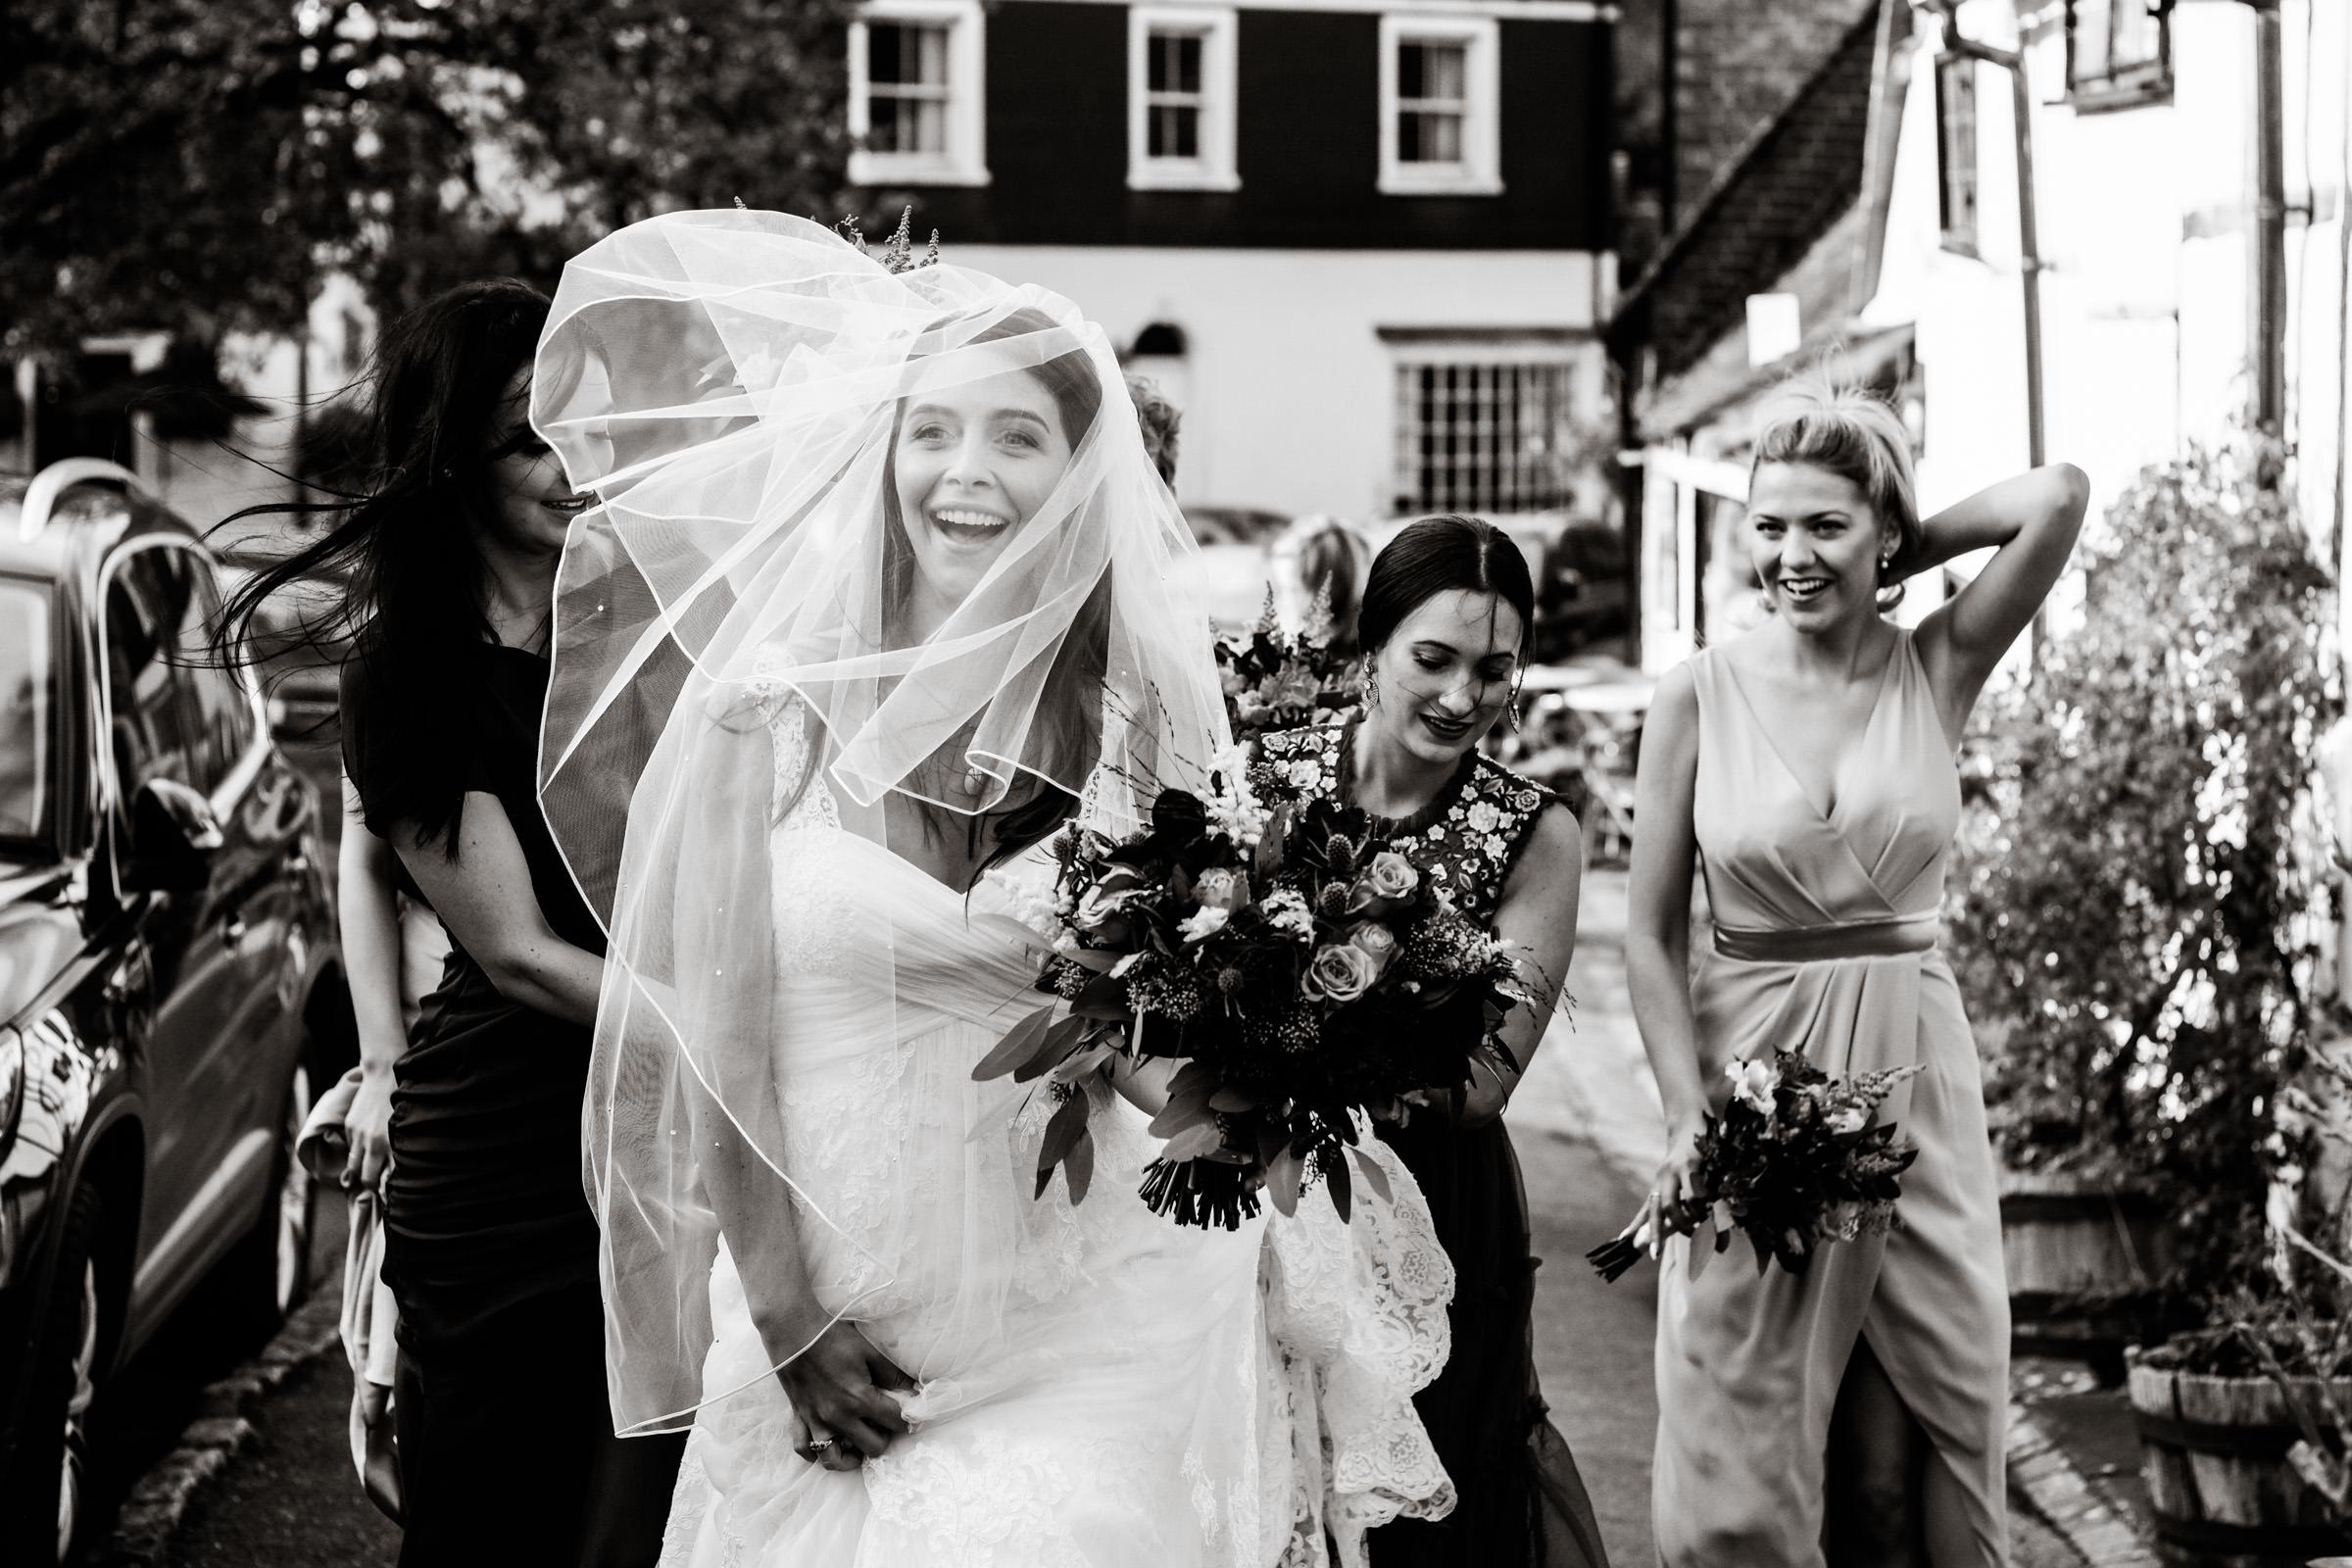 Natural+wedding+photography+portfolio+104.jpg